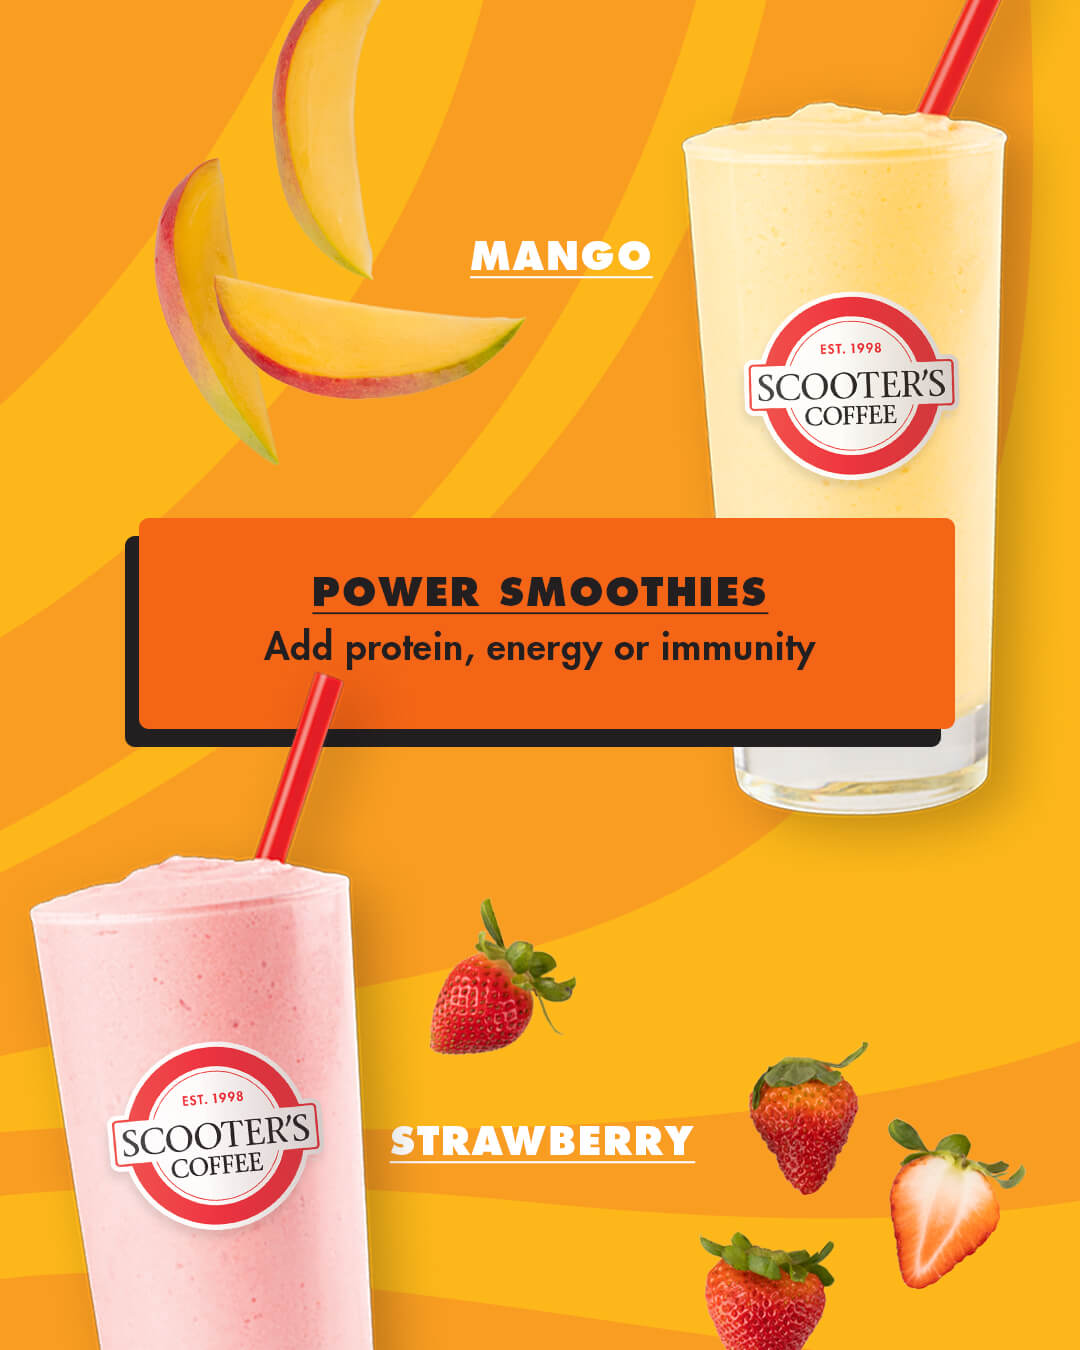 Strawberry and Mango smoothie on yellow background